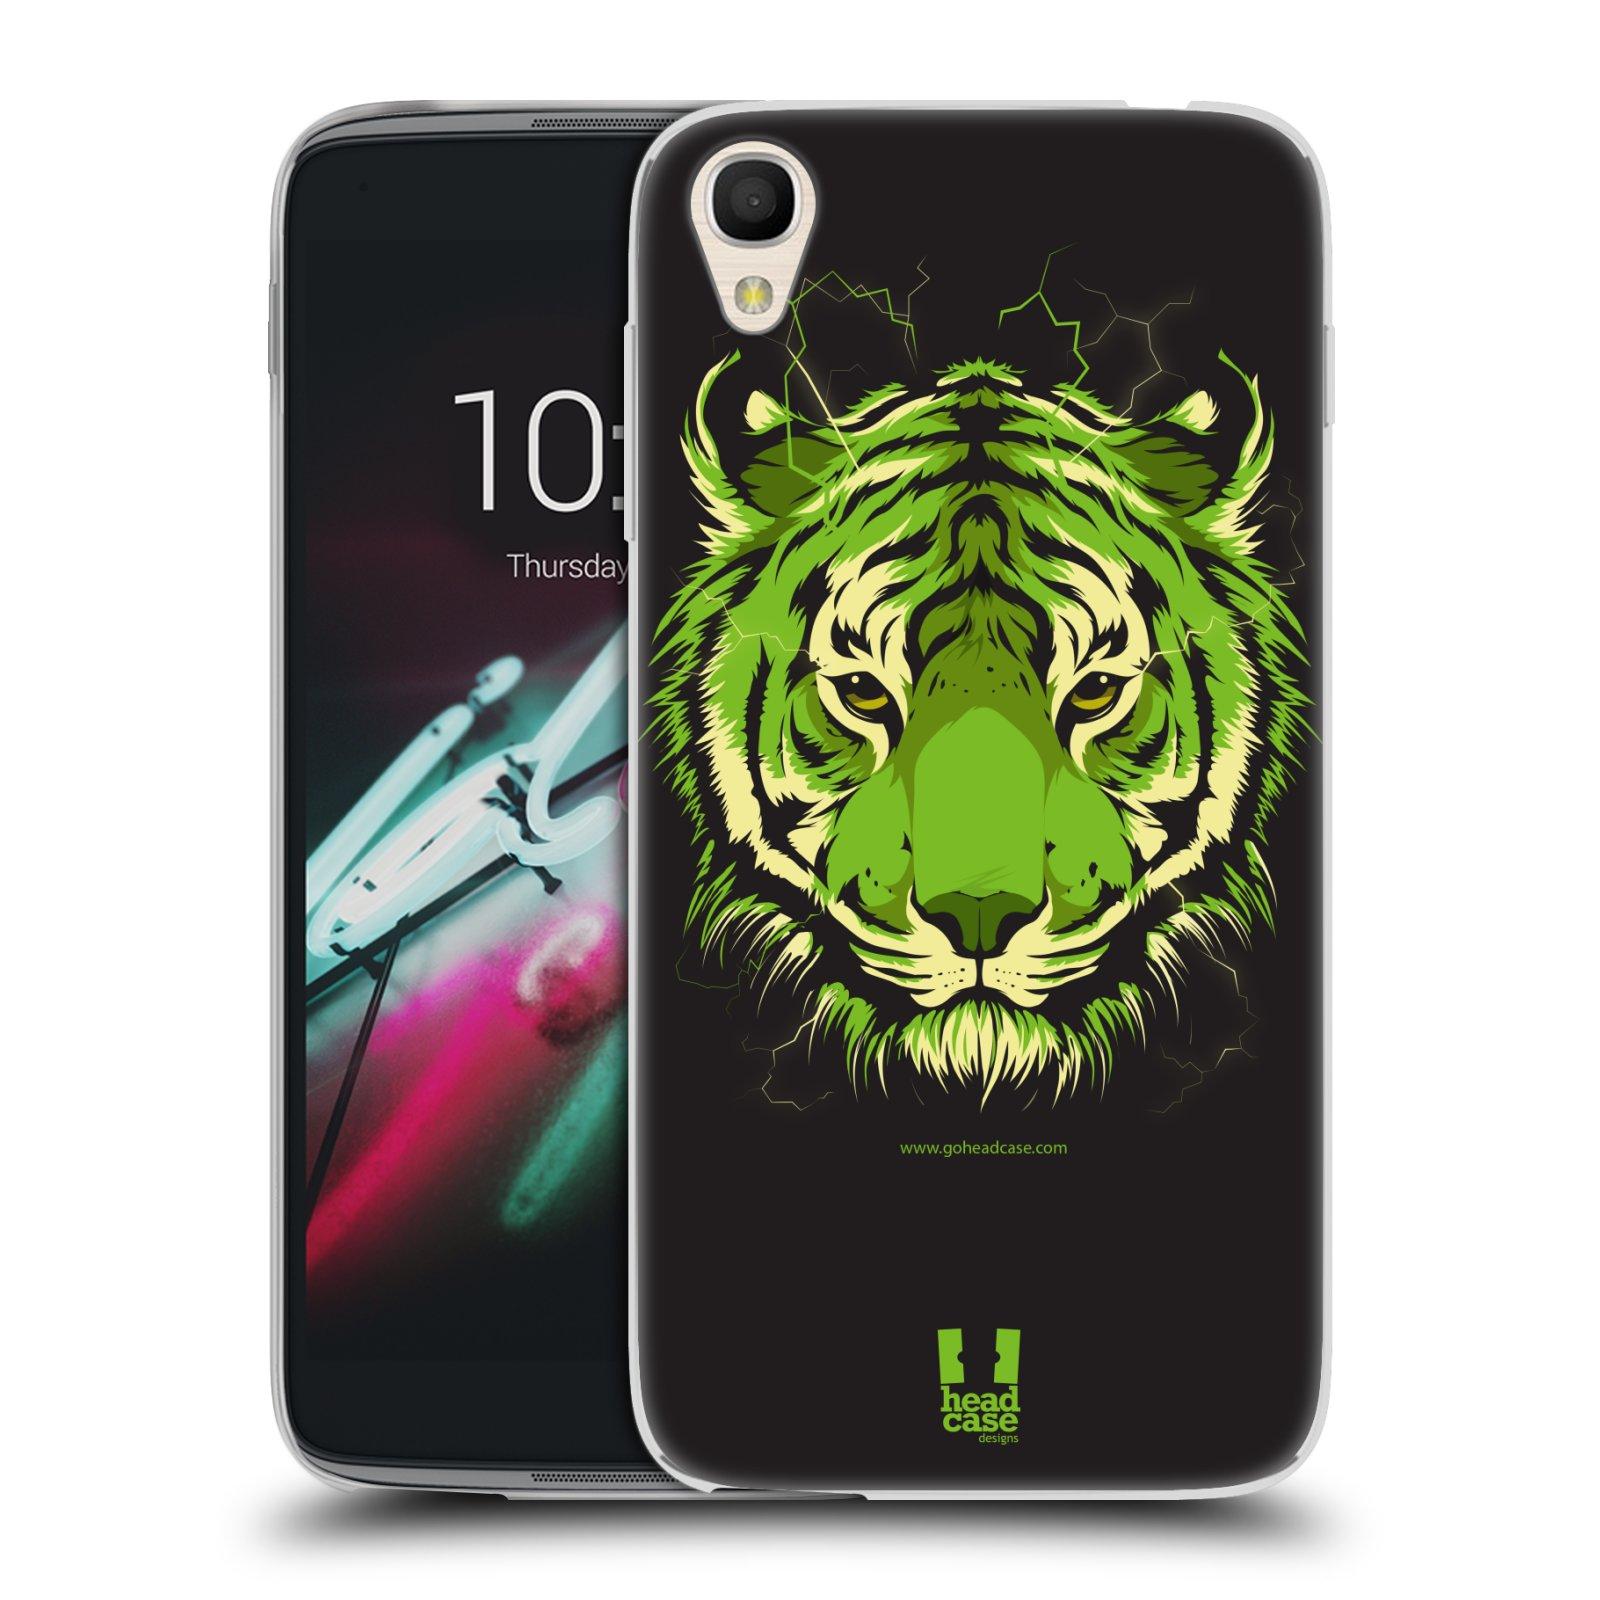 "Silikonové pouzdro na mobil Alcatel One Touch 6039Y Idol 3 HEAD CASE BENGÁLSKÝ TYGR (Silikonový kryt či obal na mobilní telefon Alcatel One Touch Idol 3 OT-6039Y s 4,7"" displejem)"